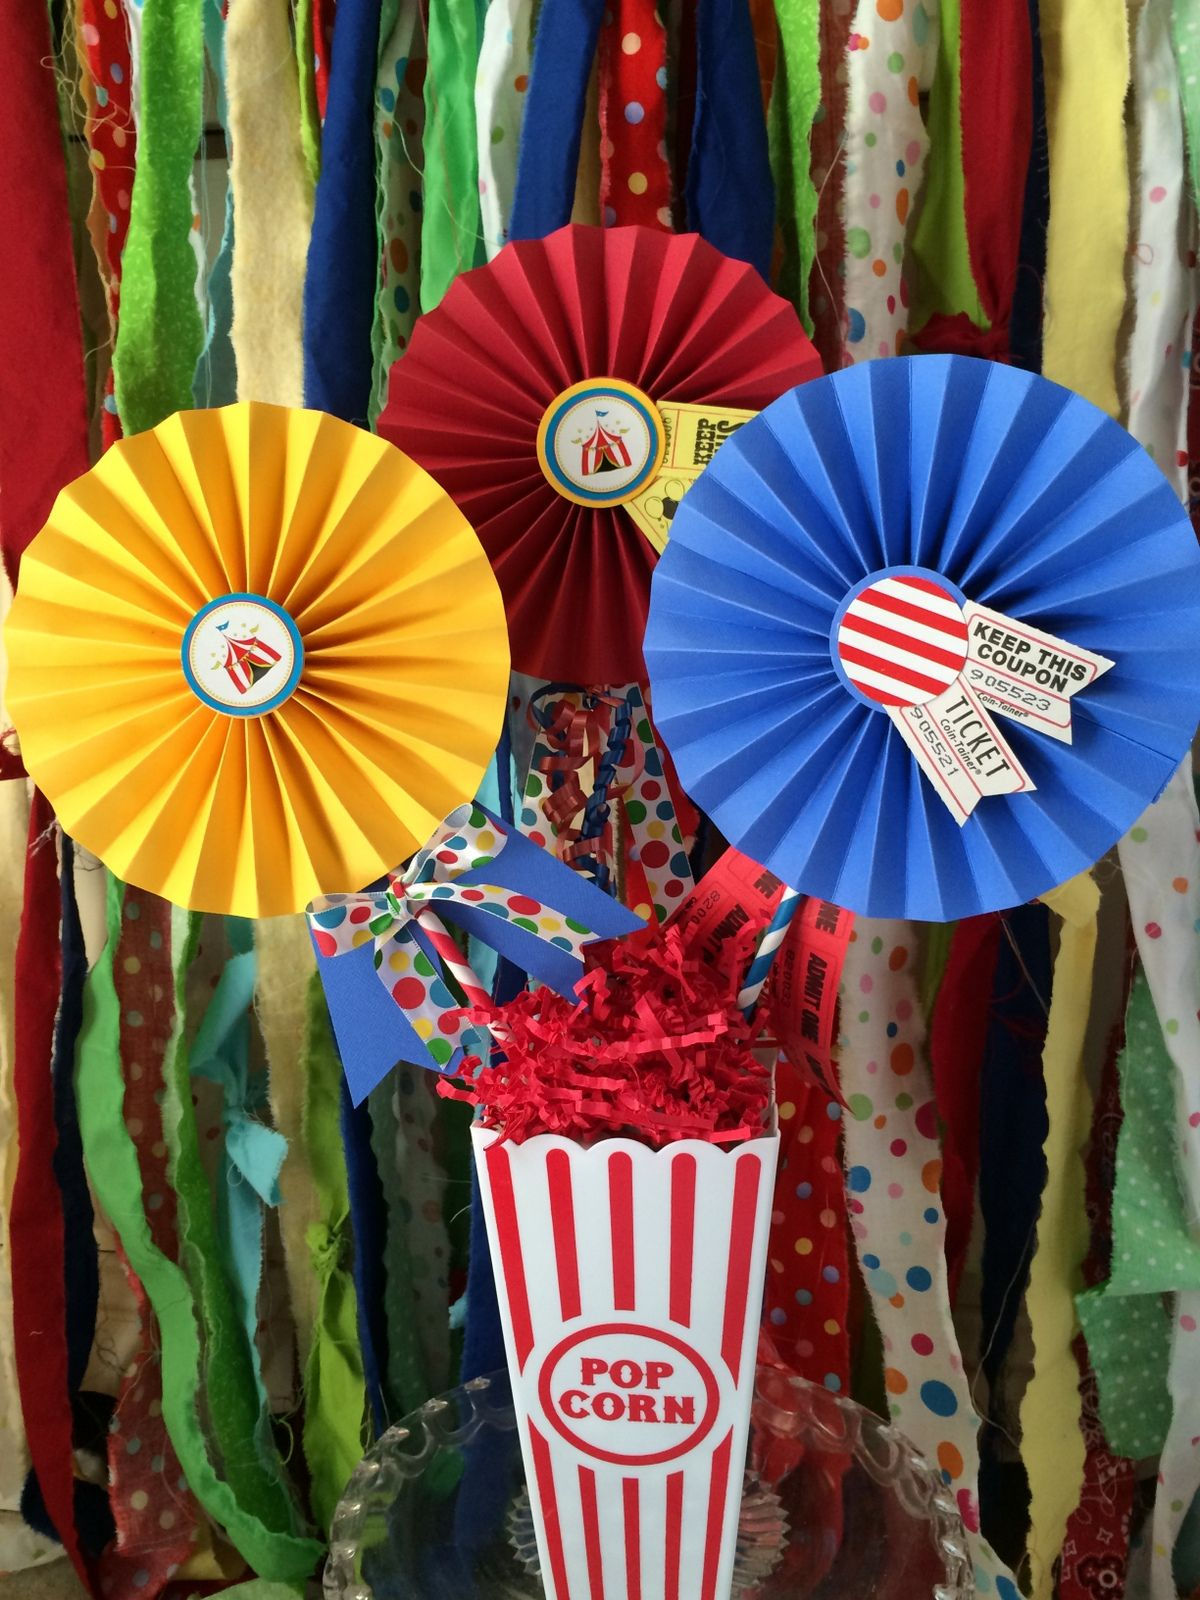 circus ideas party diy of decorations decor decorating